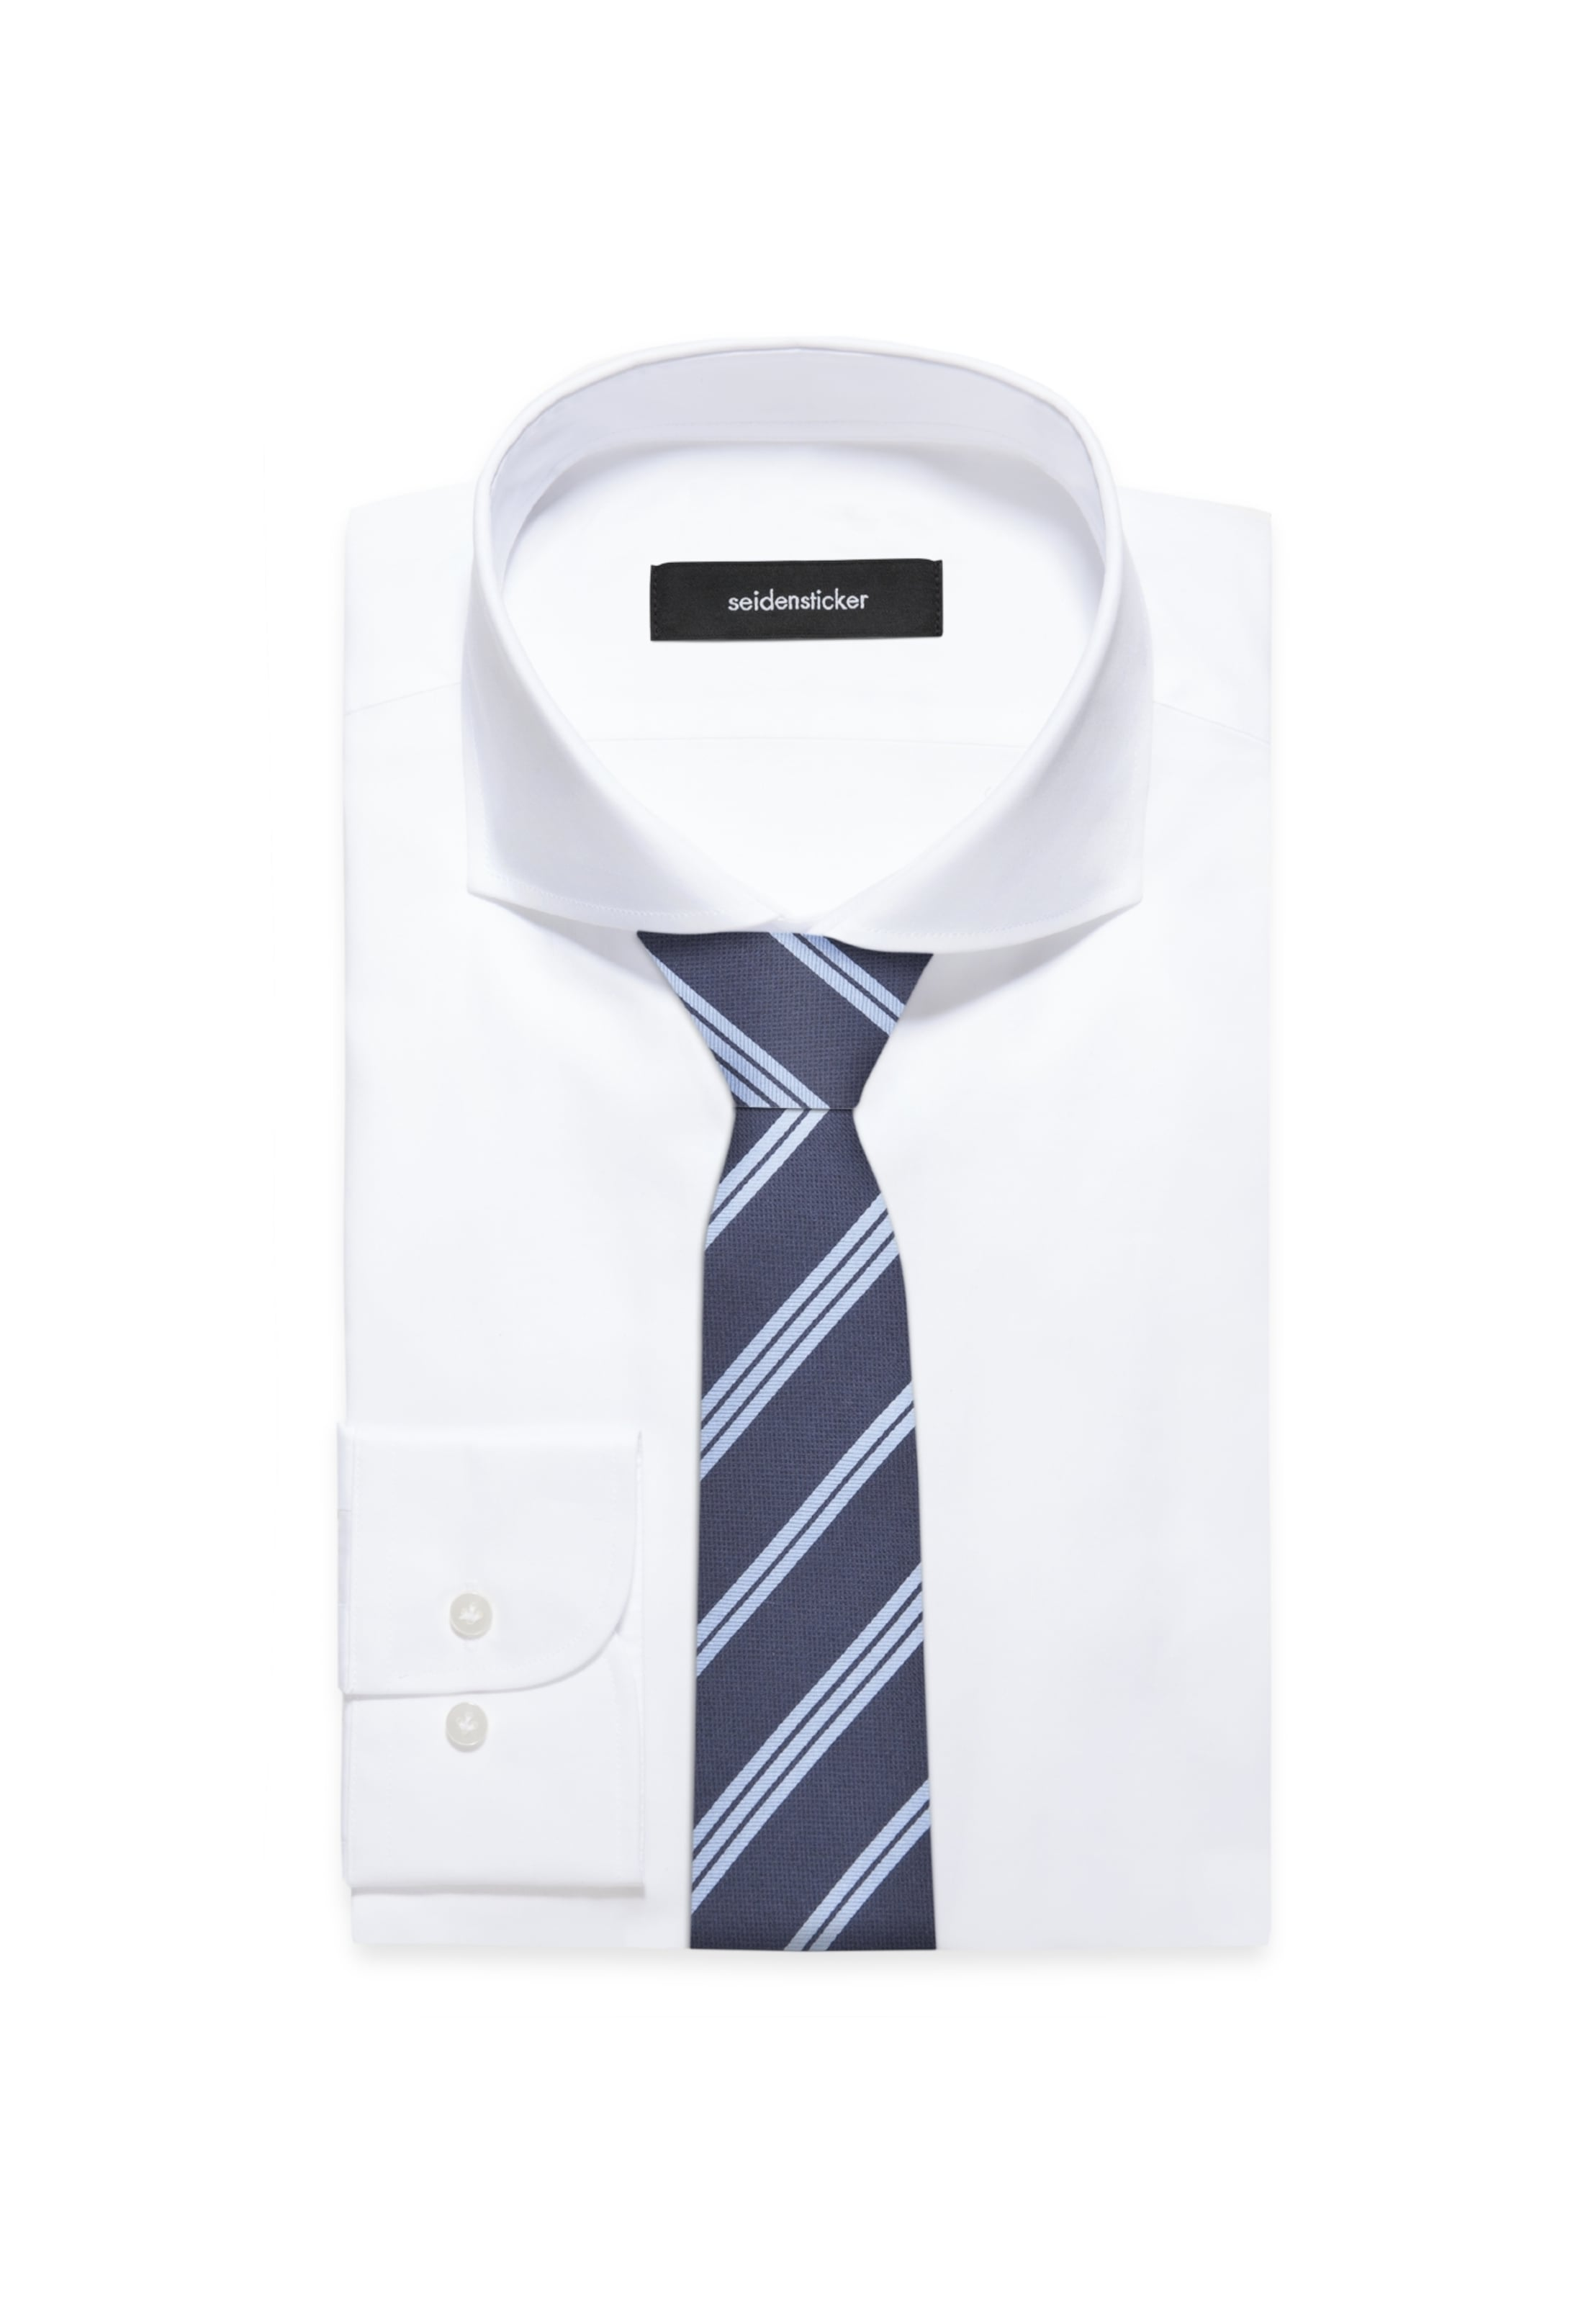 'schwarze In Krawatte Rose' HellblauDunkelblau Seidensticker LGMqSVUpjz